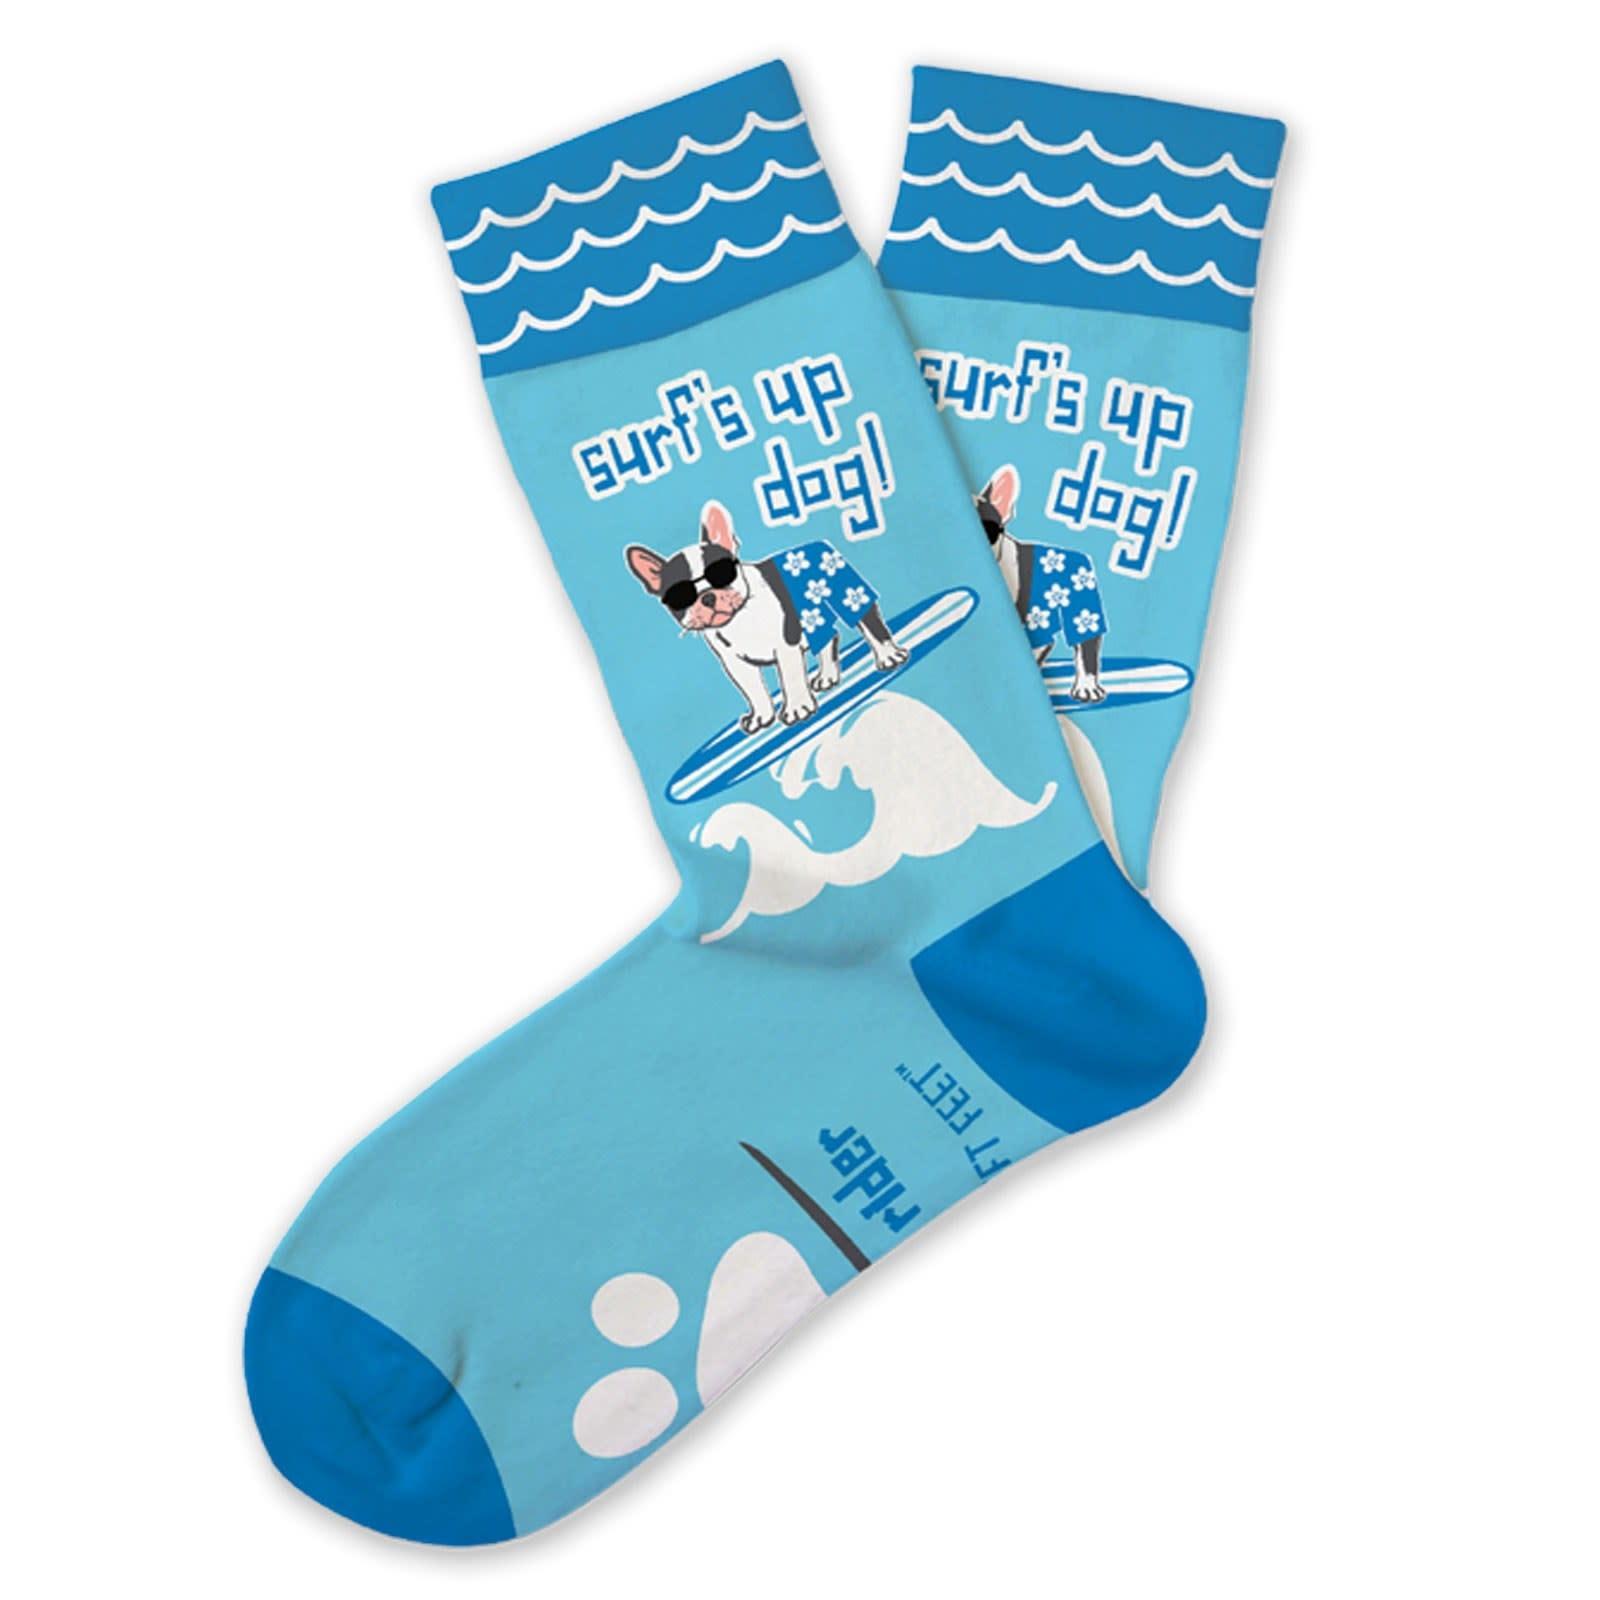 DM MERCHANDISING Surf's Up Dog Socks - Ages 3-6